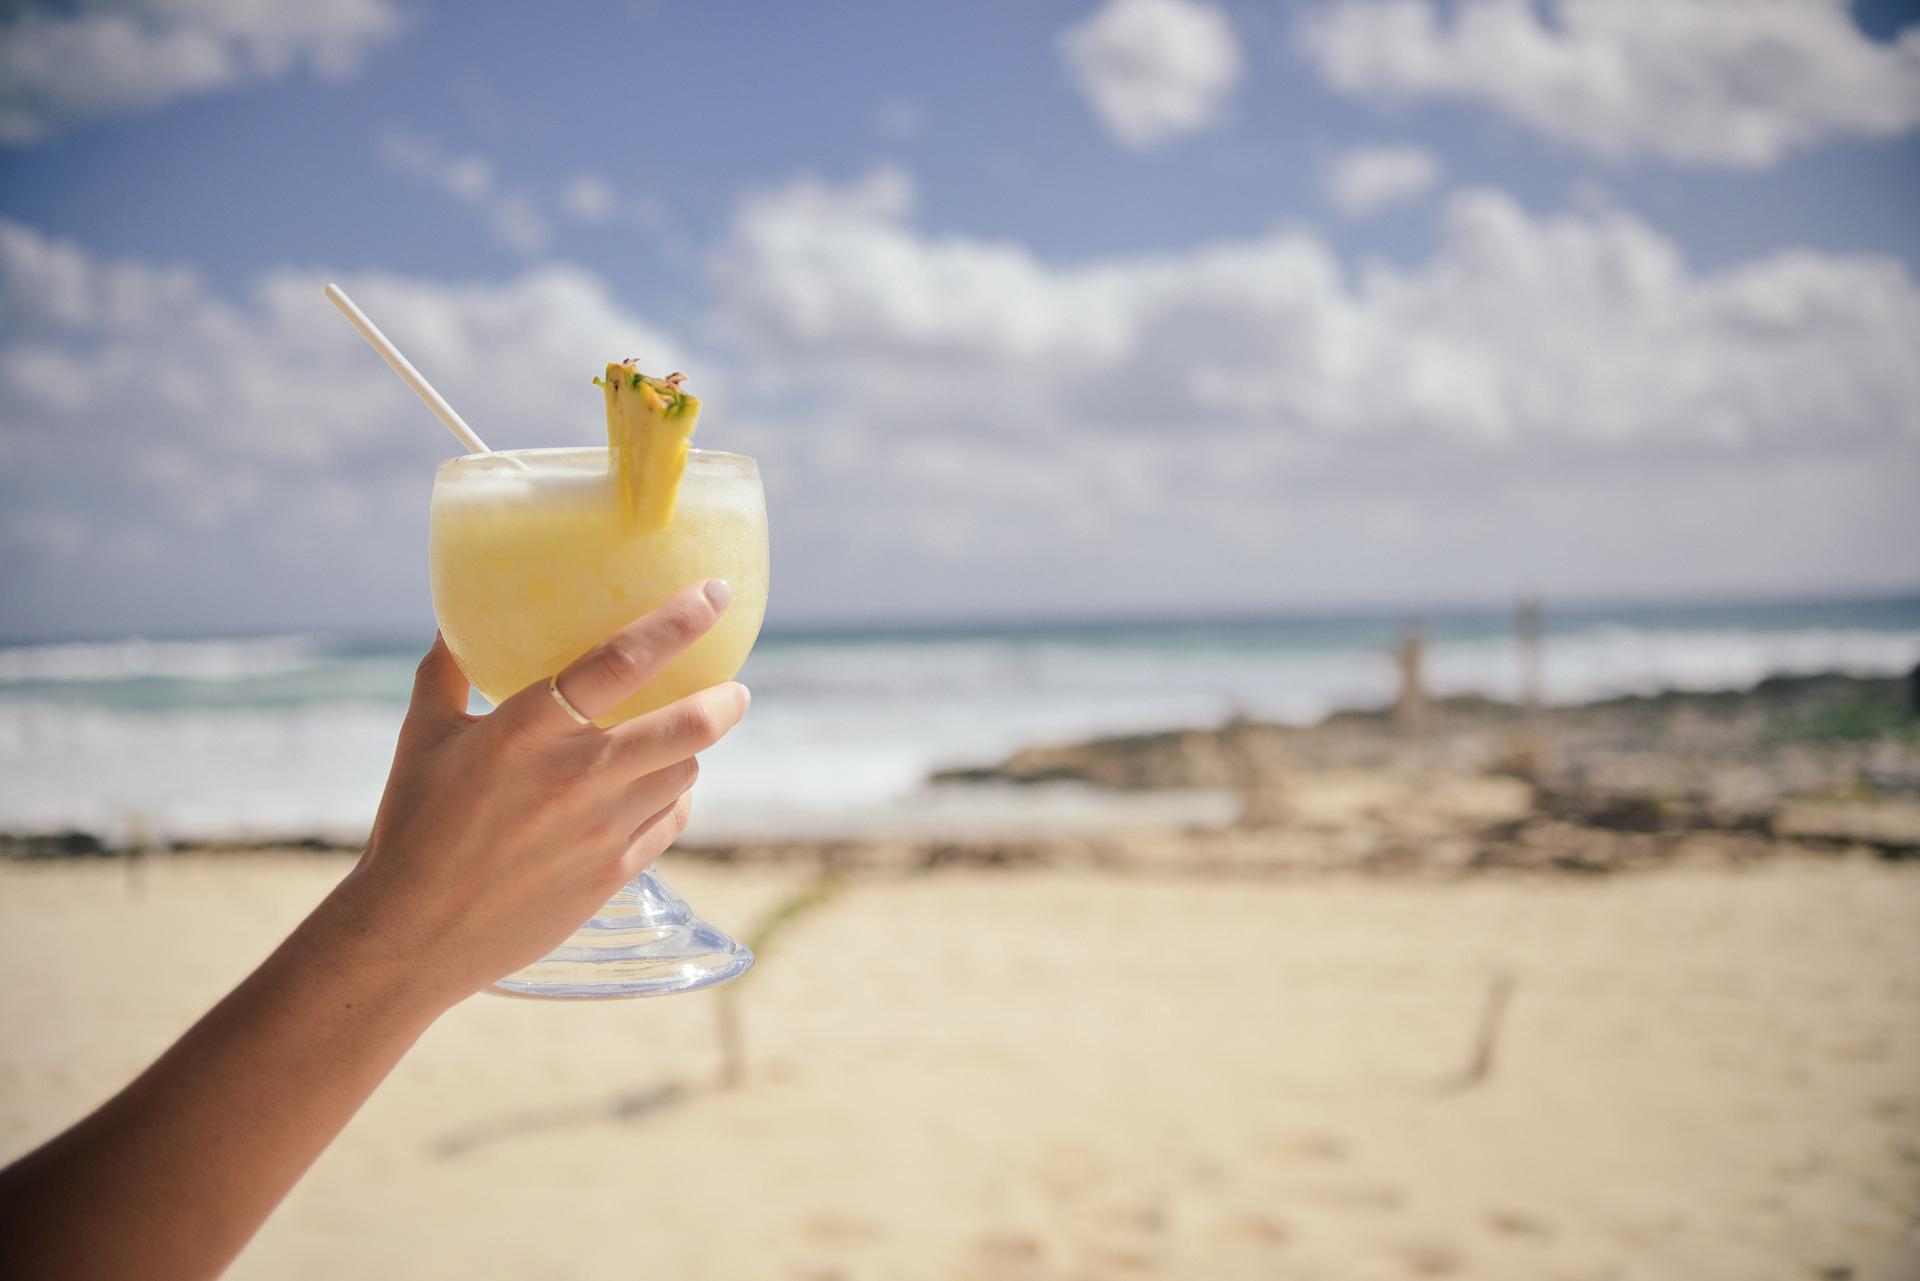 Woman holding a pina colada on a beach